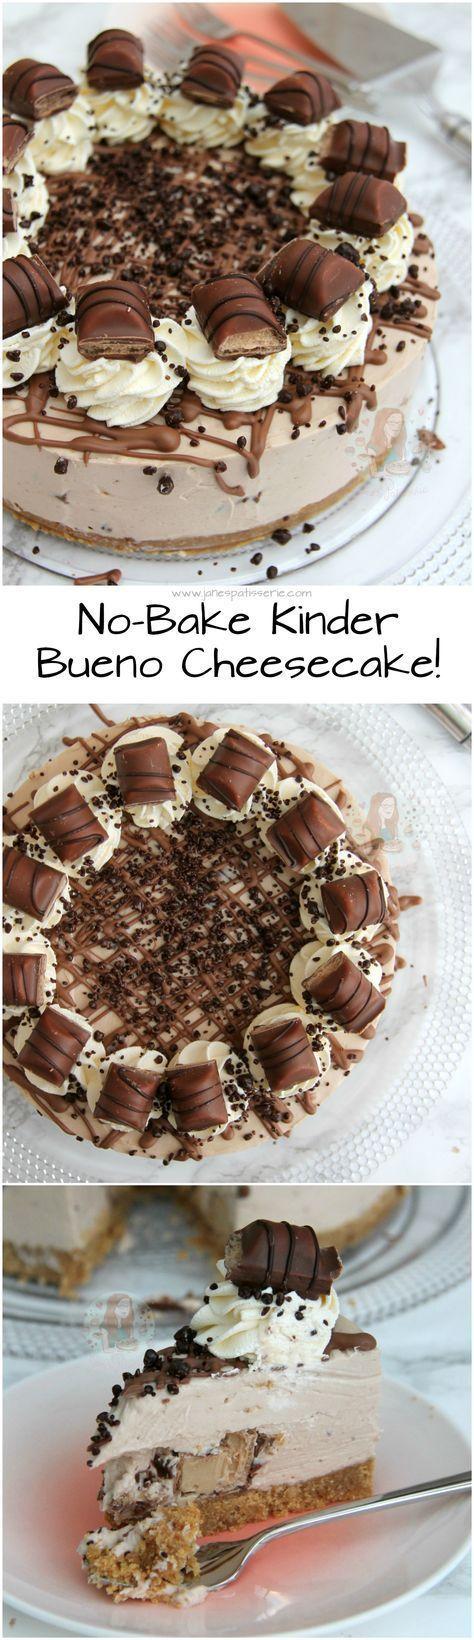 No-Bake Kinder Bueno Käsekuchen !! Butterkeks-Basis, Kinder Chocolate & Kin